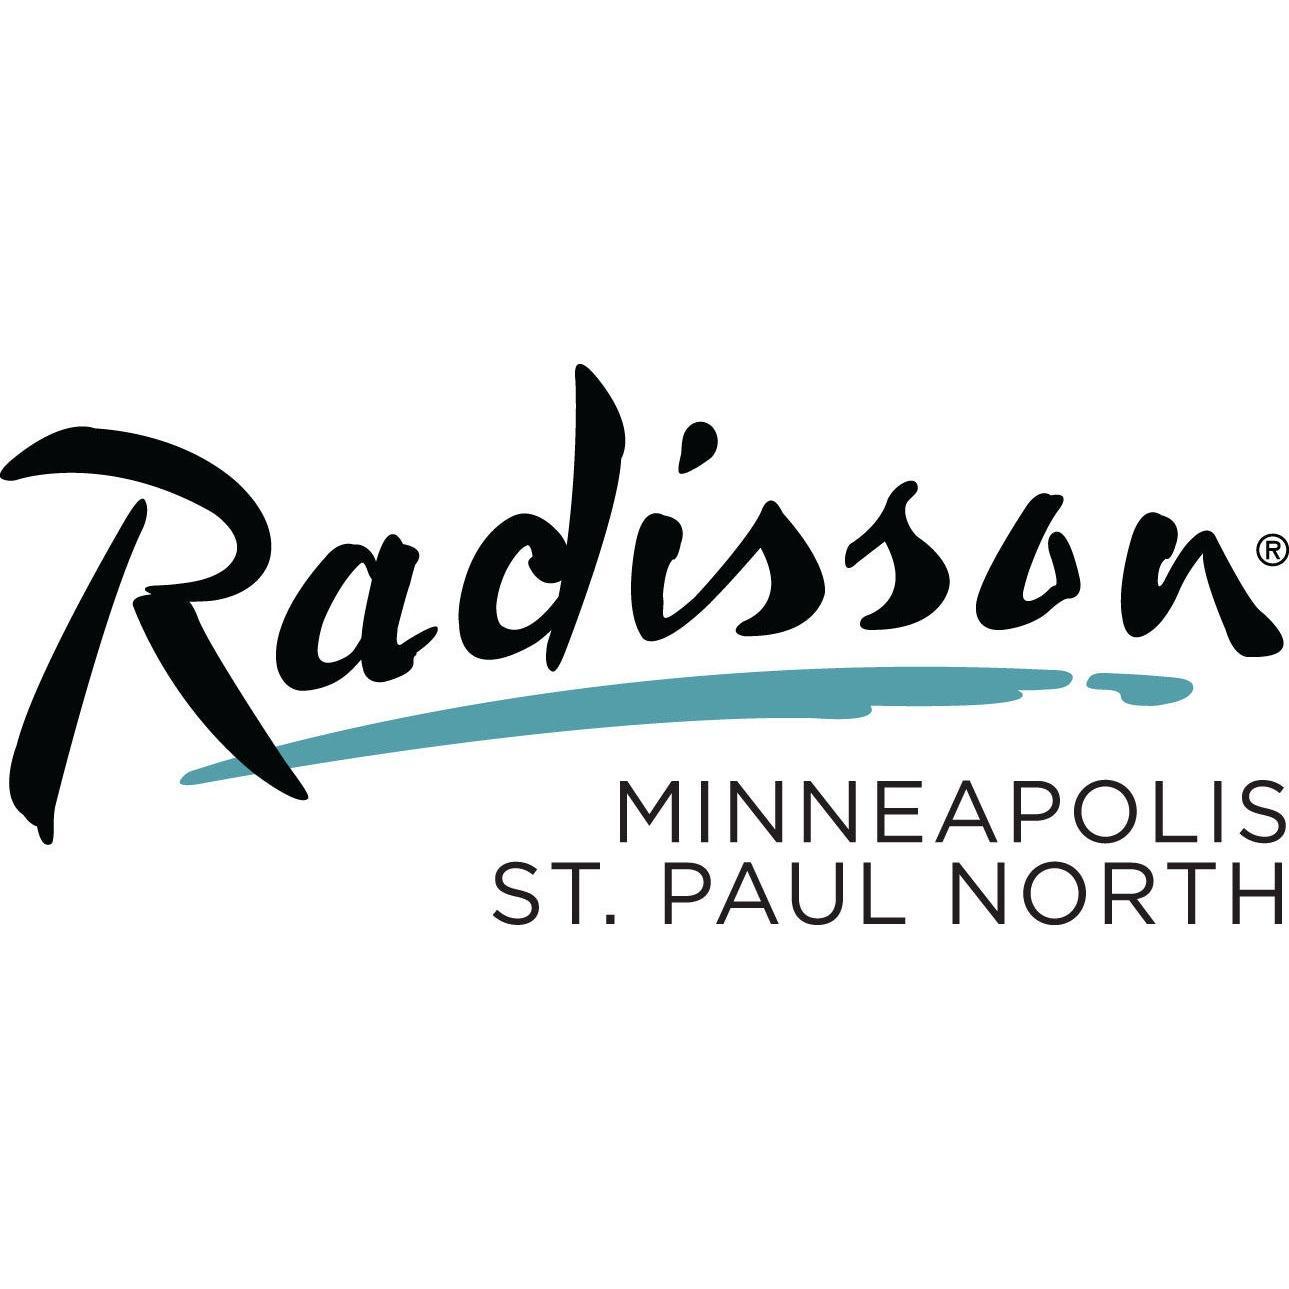 Radisson Hotel Minneapolis/St. Paul North - Closed - Roseville, MN 55113 - (651)636-4567 | ShowMeLocal.com